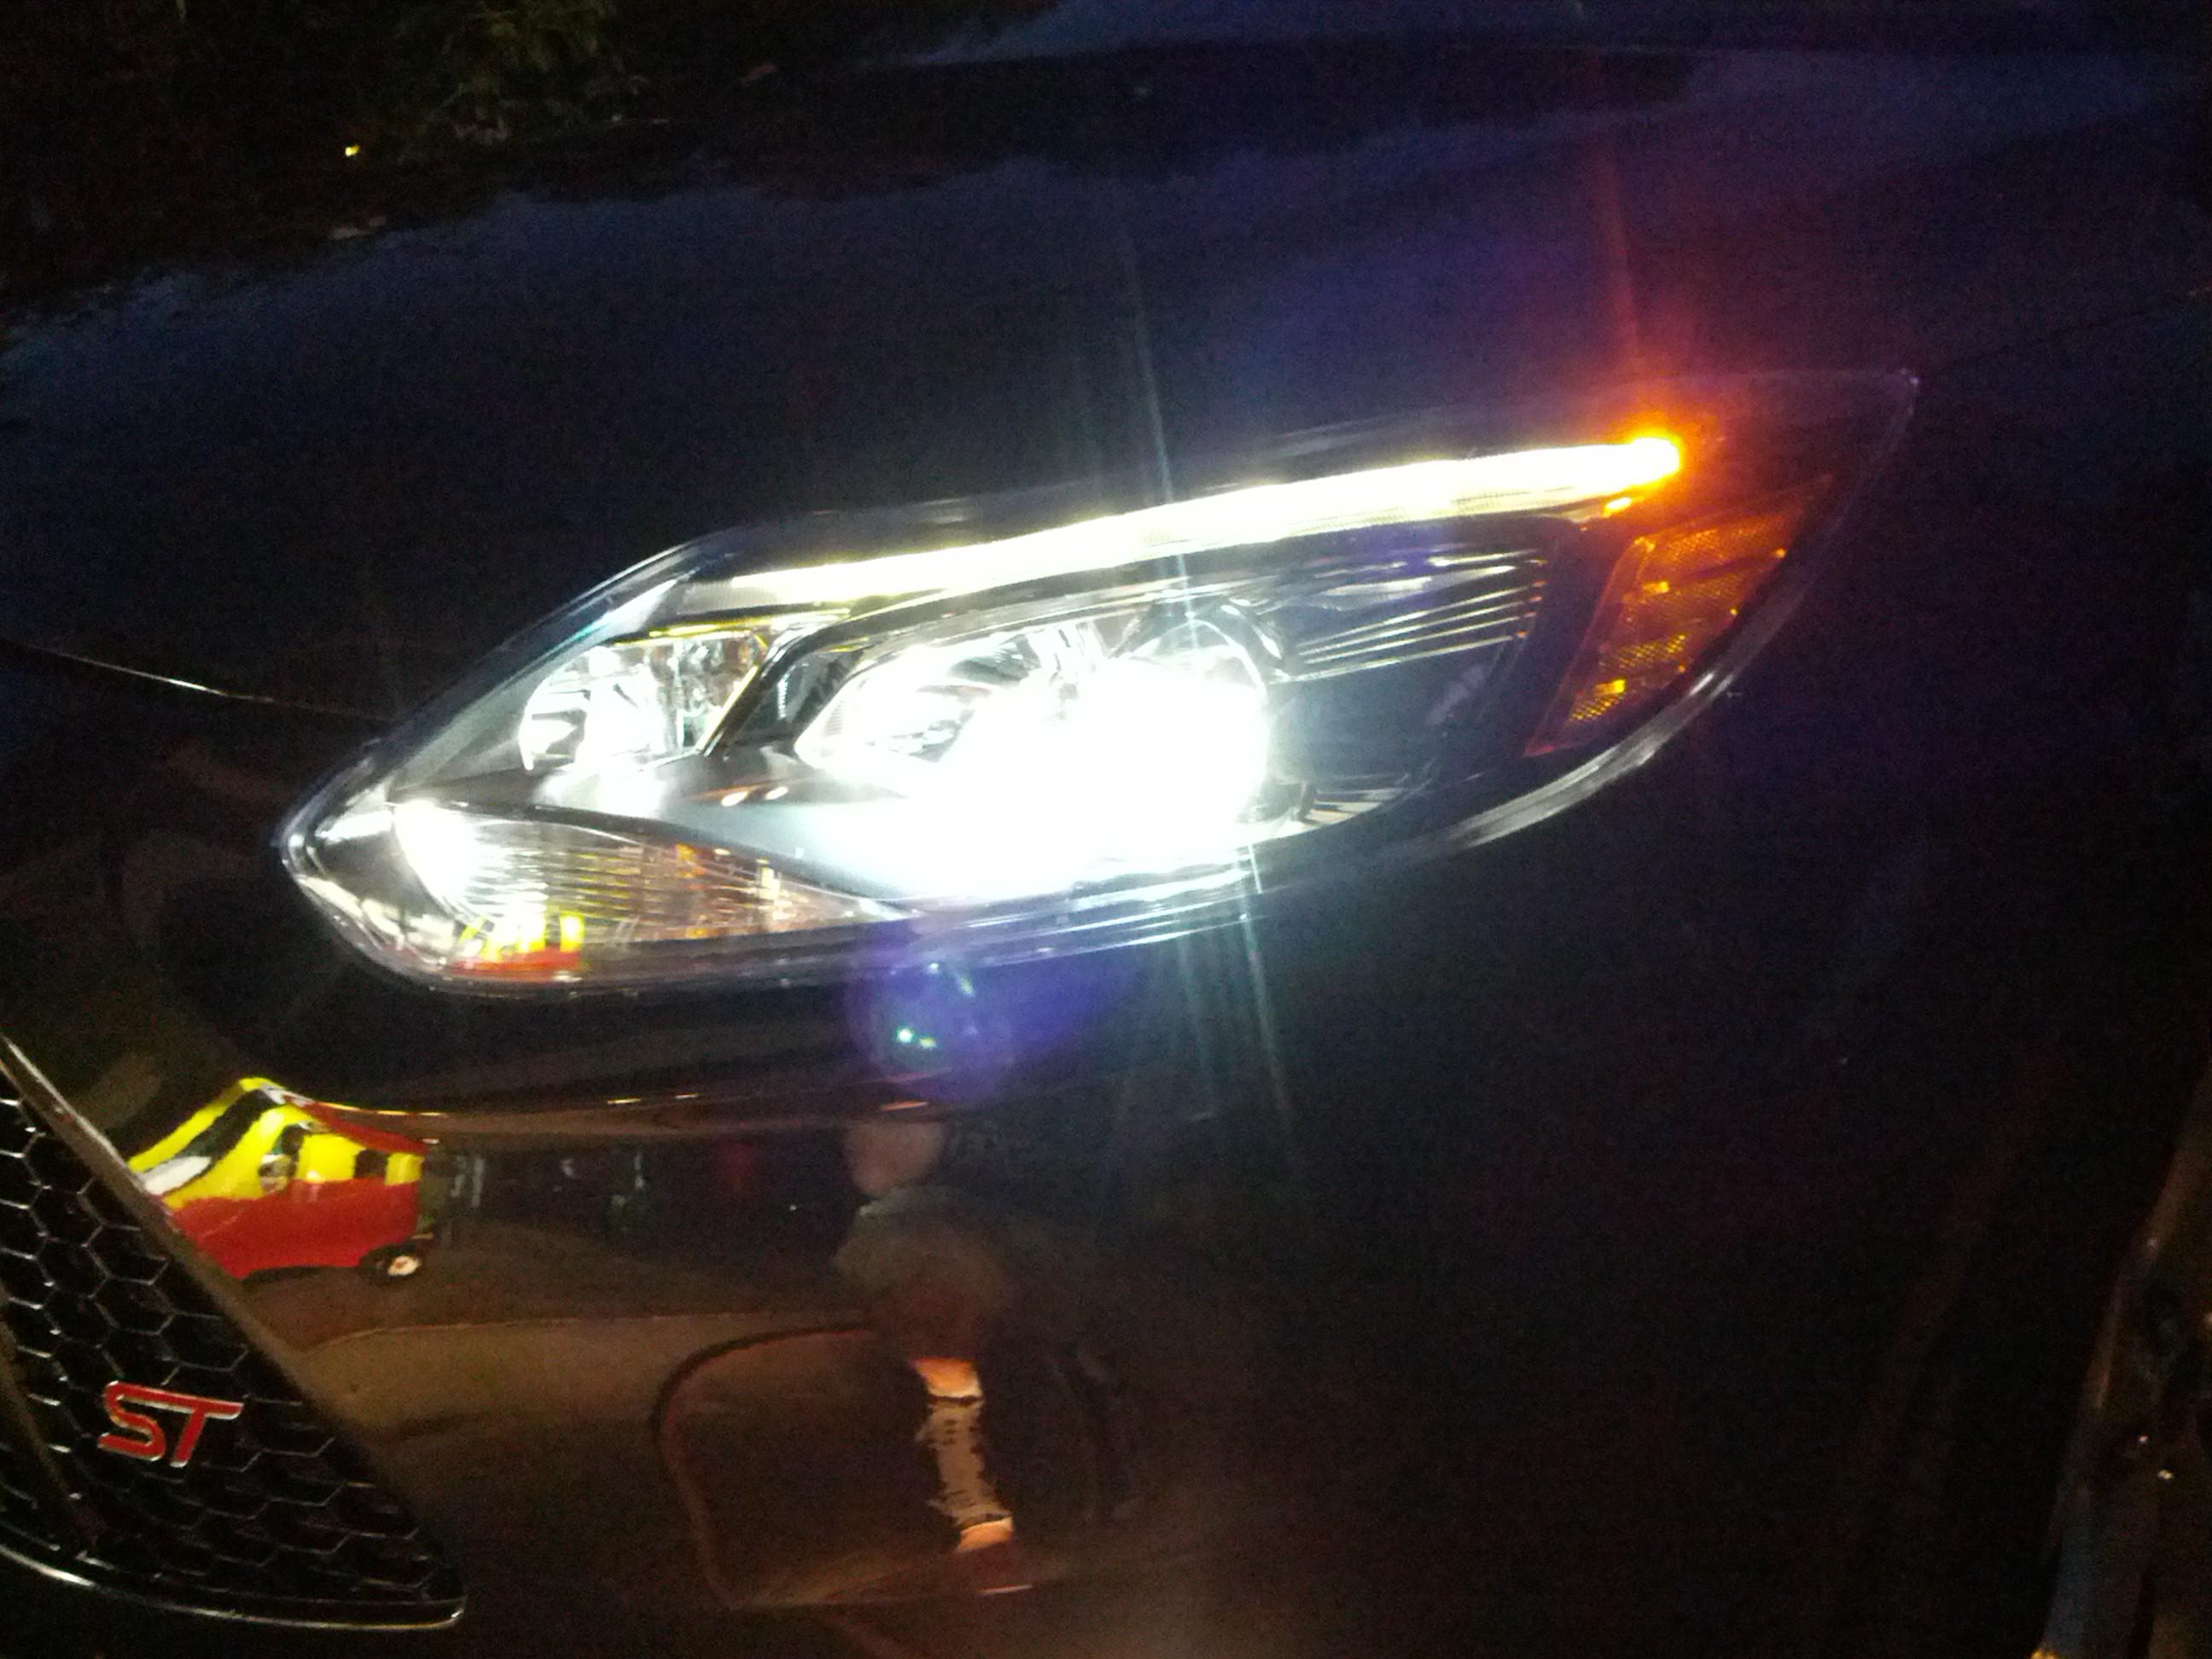 st3 headlights